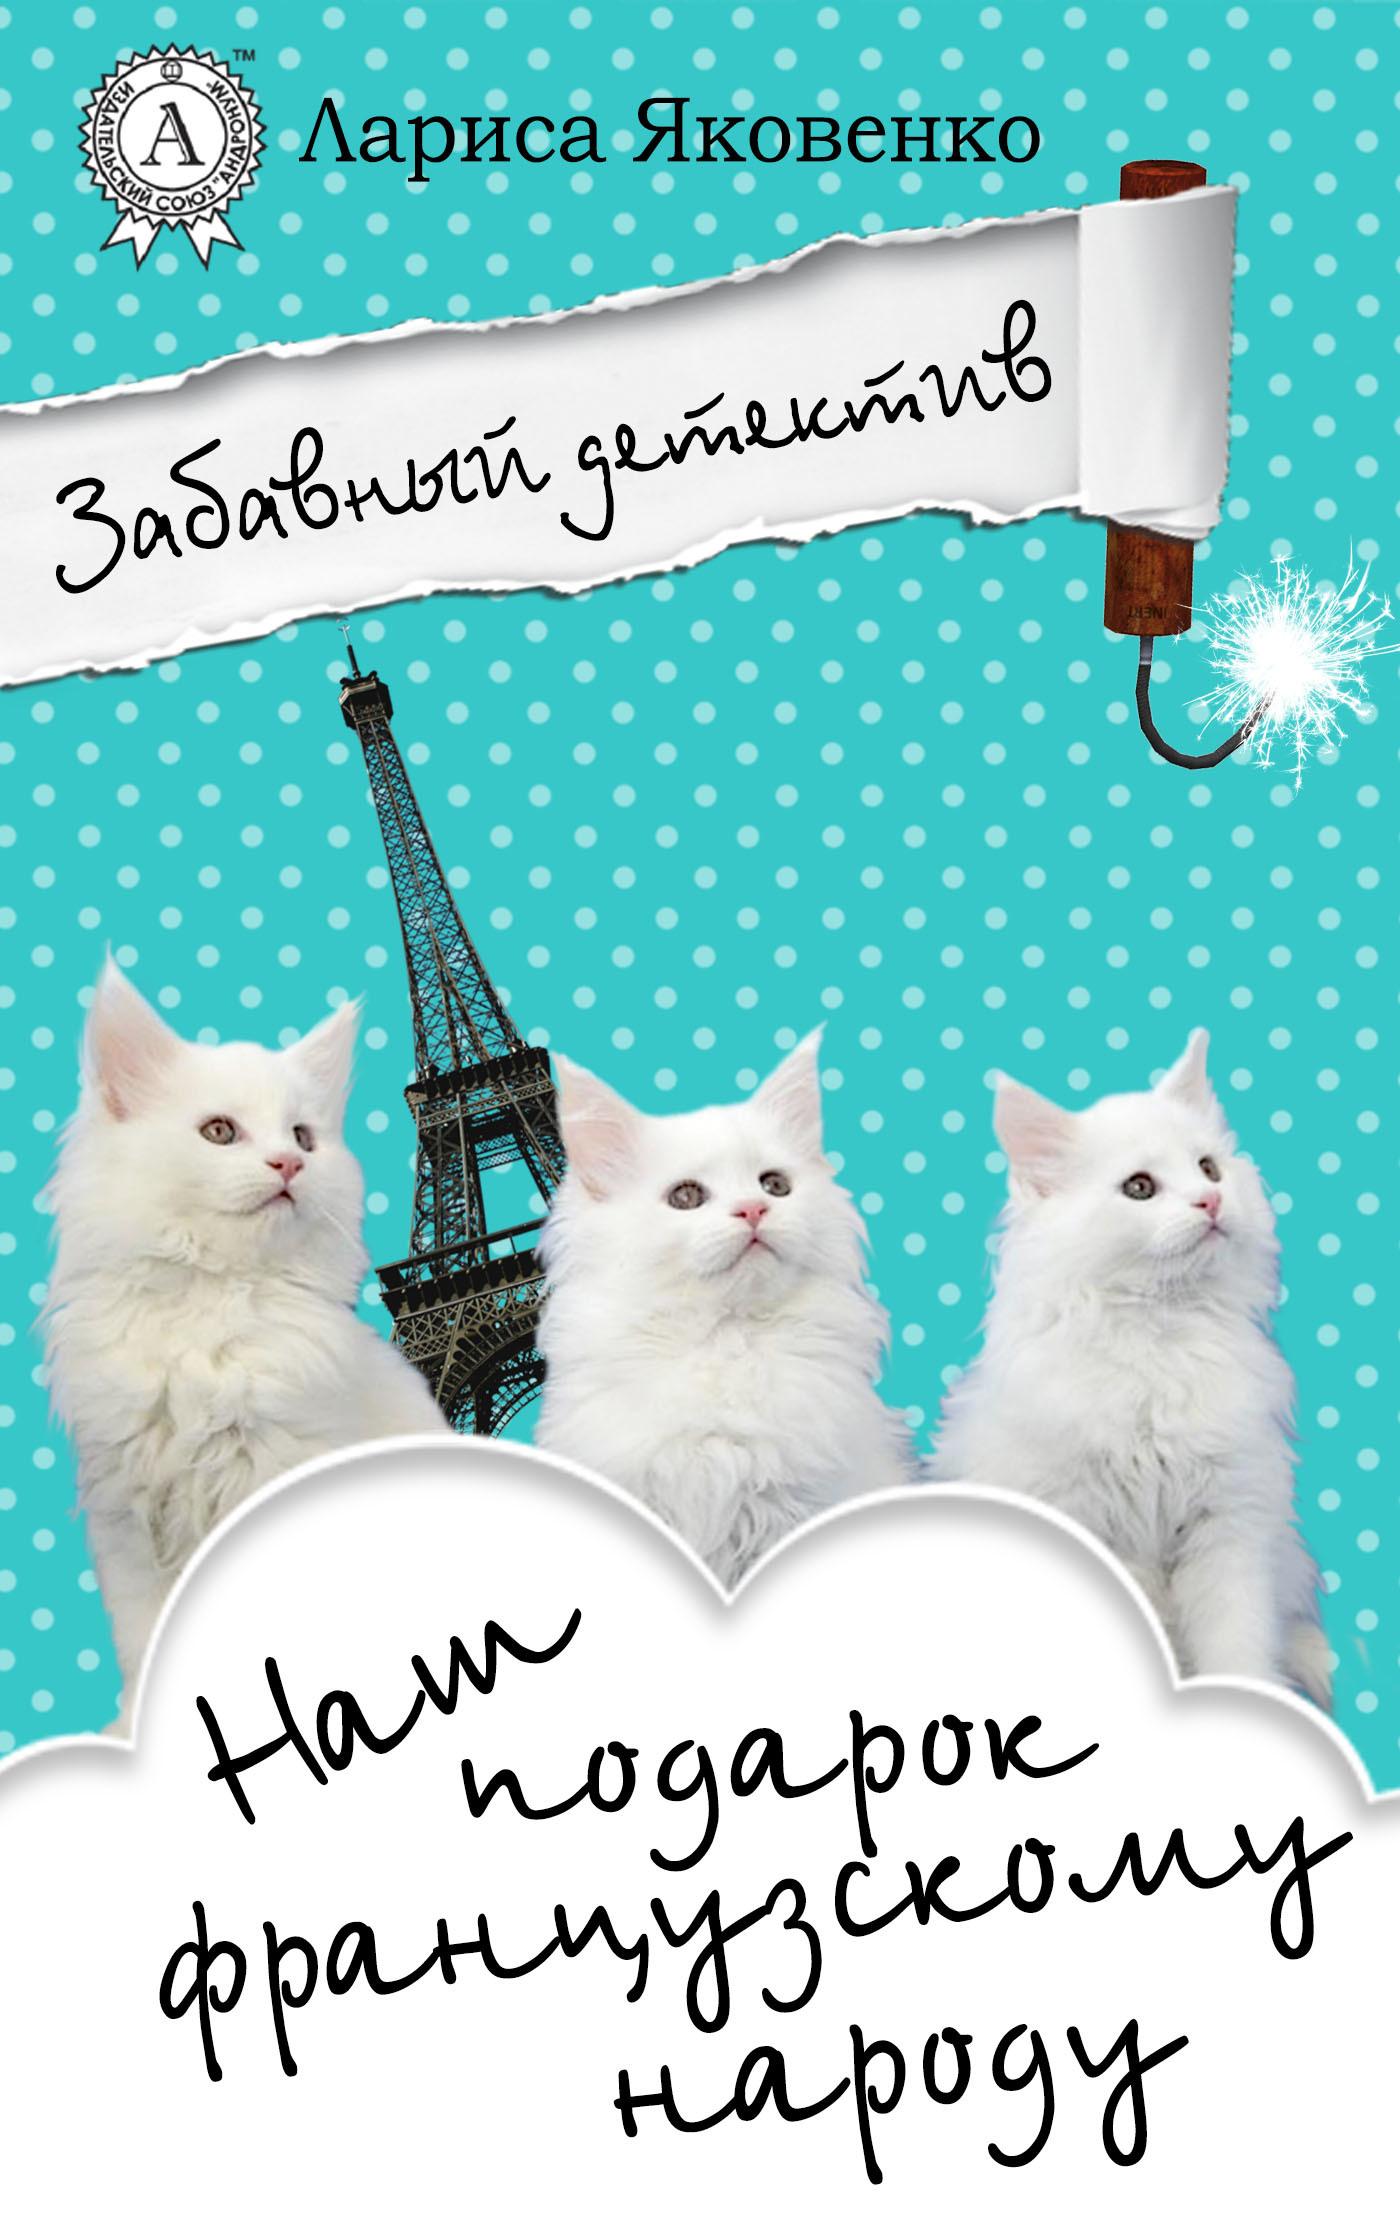 Наш подарок французскому народу